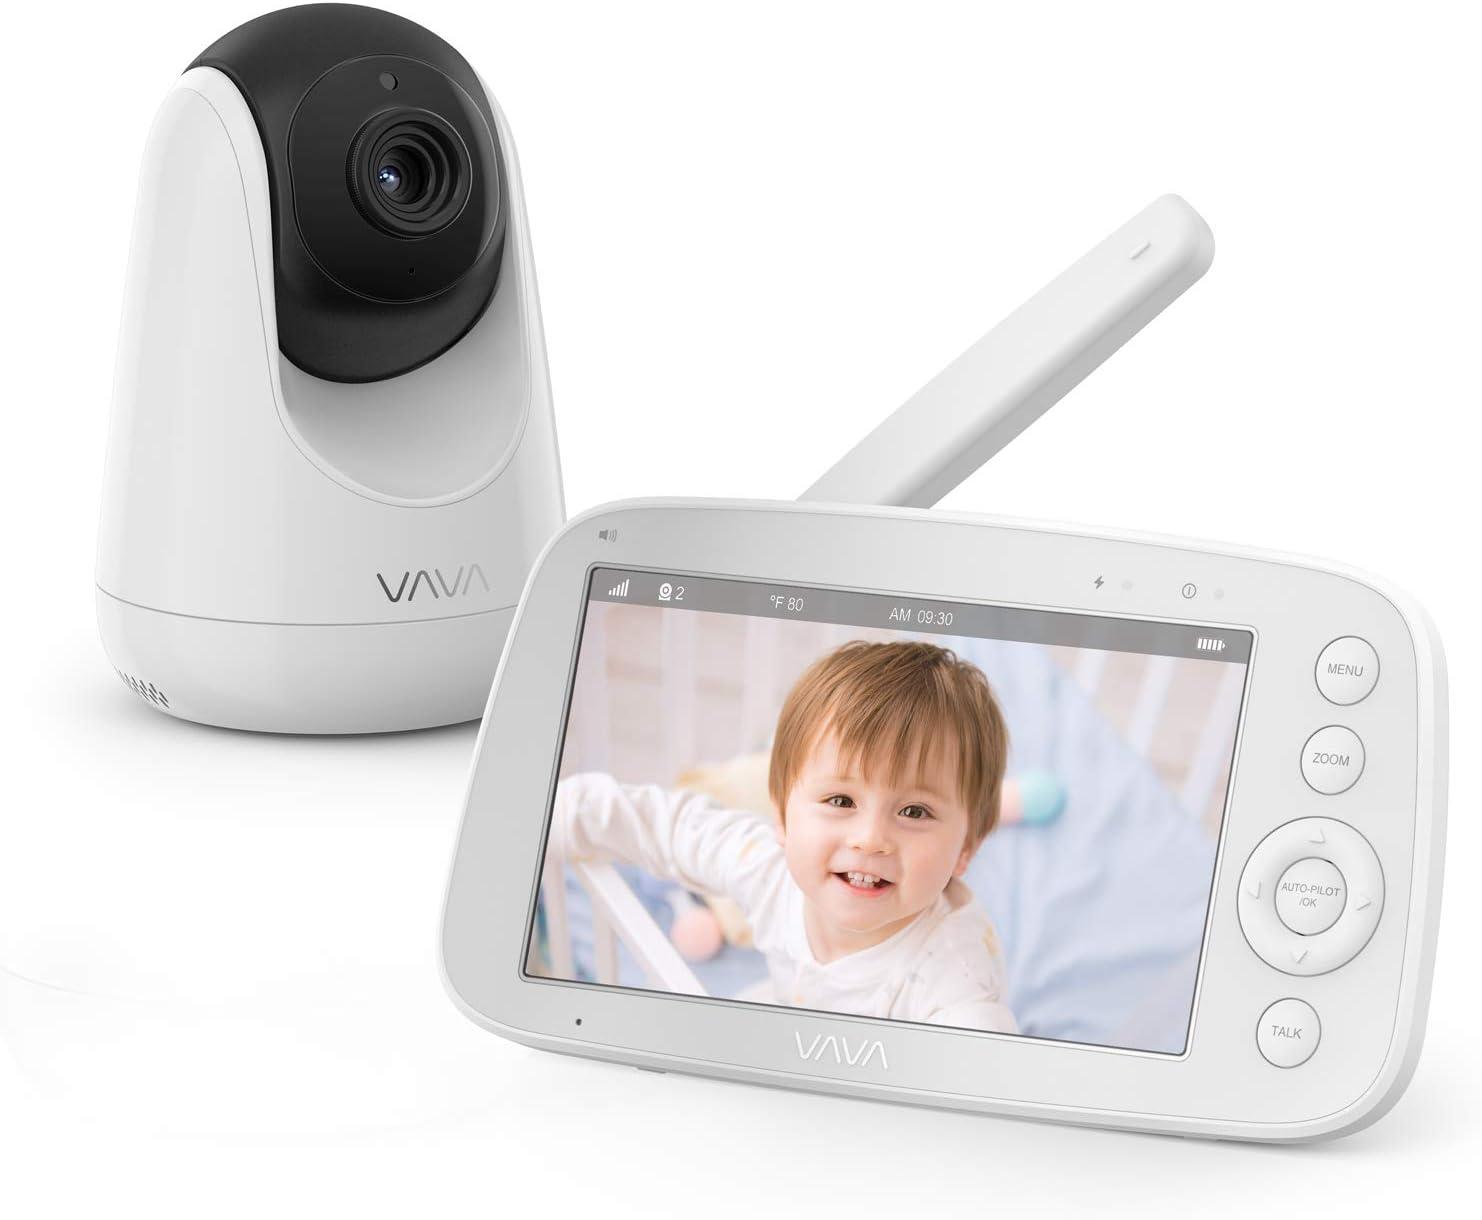 VAVA ベビーモニター カメラ VA-IH006